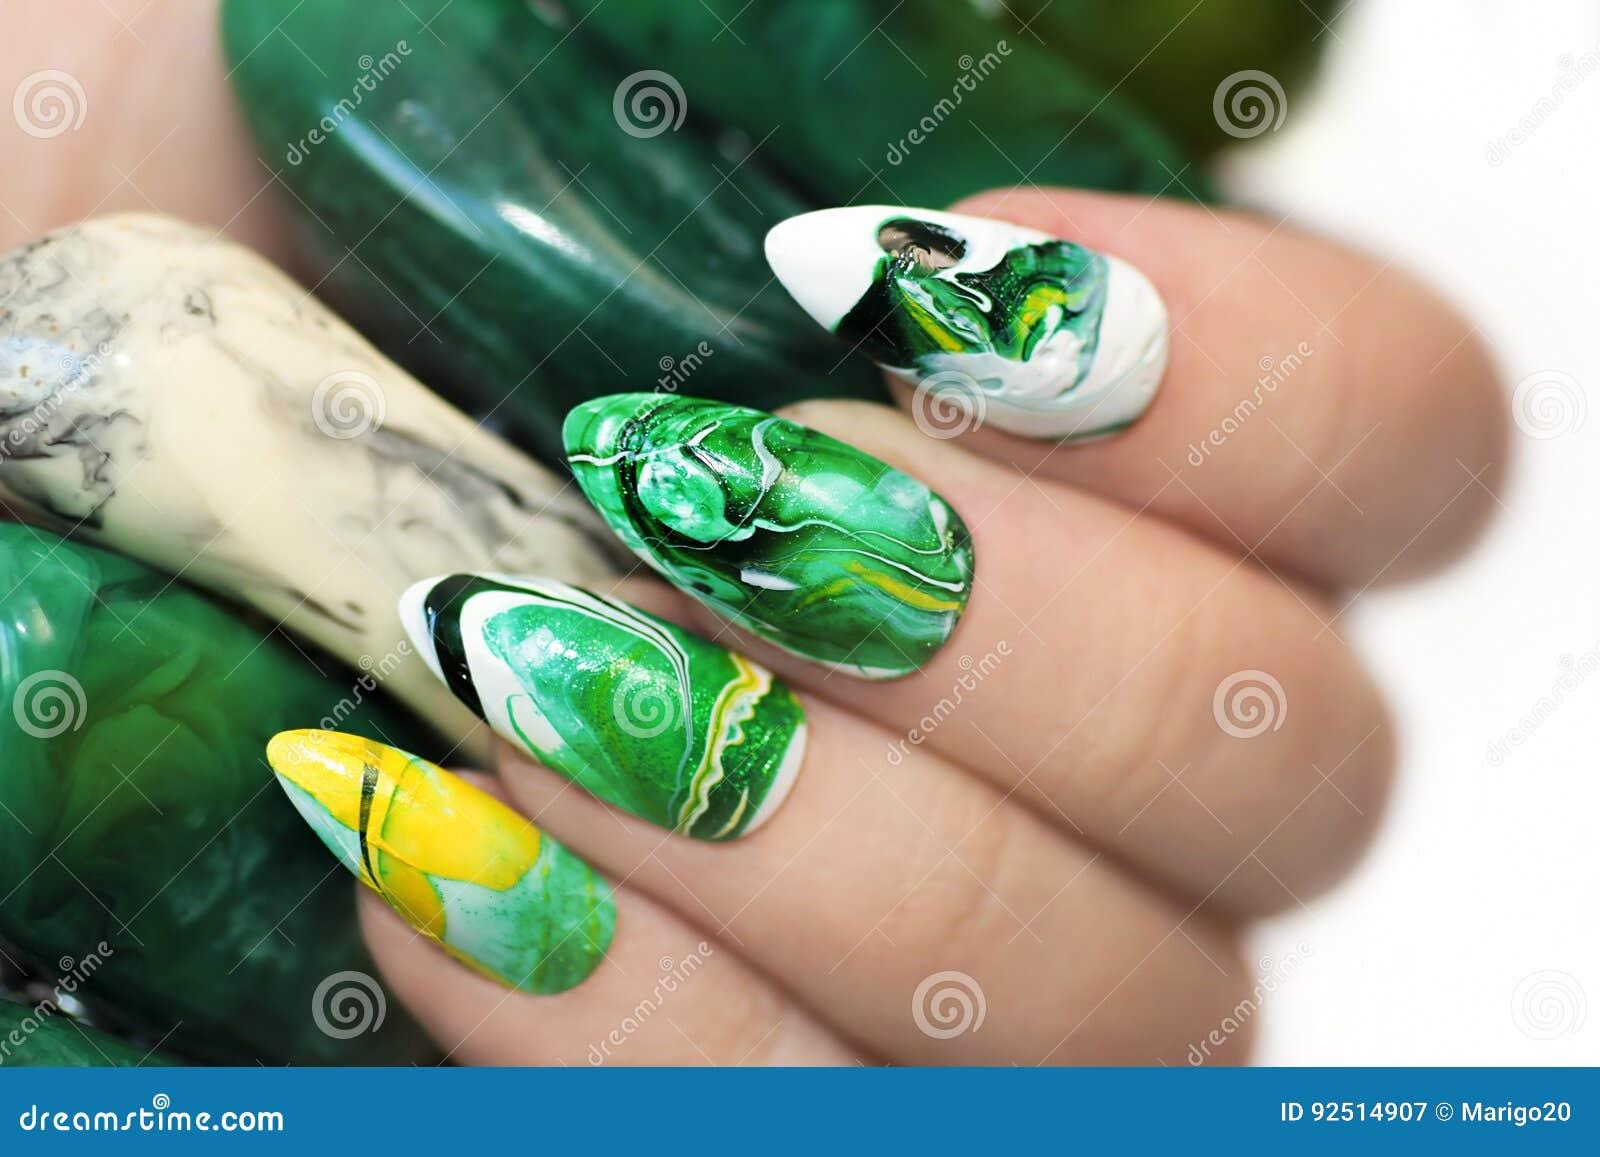 Stone nail design. stock image. Image of fashion, fingers - 92514907